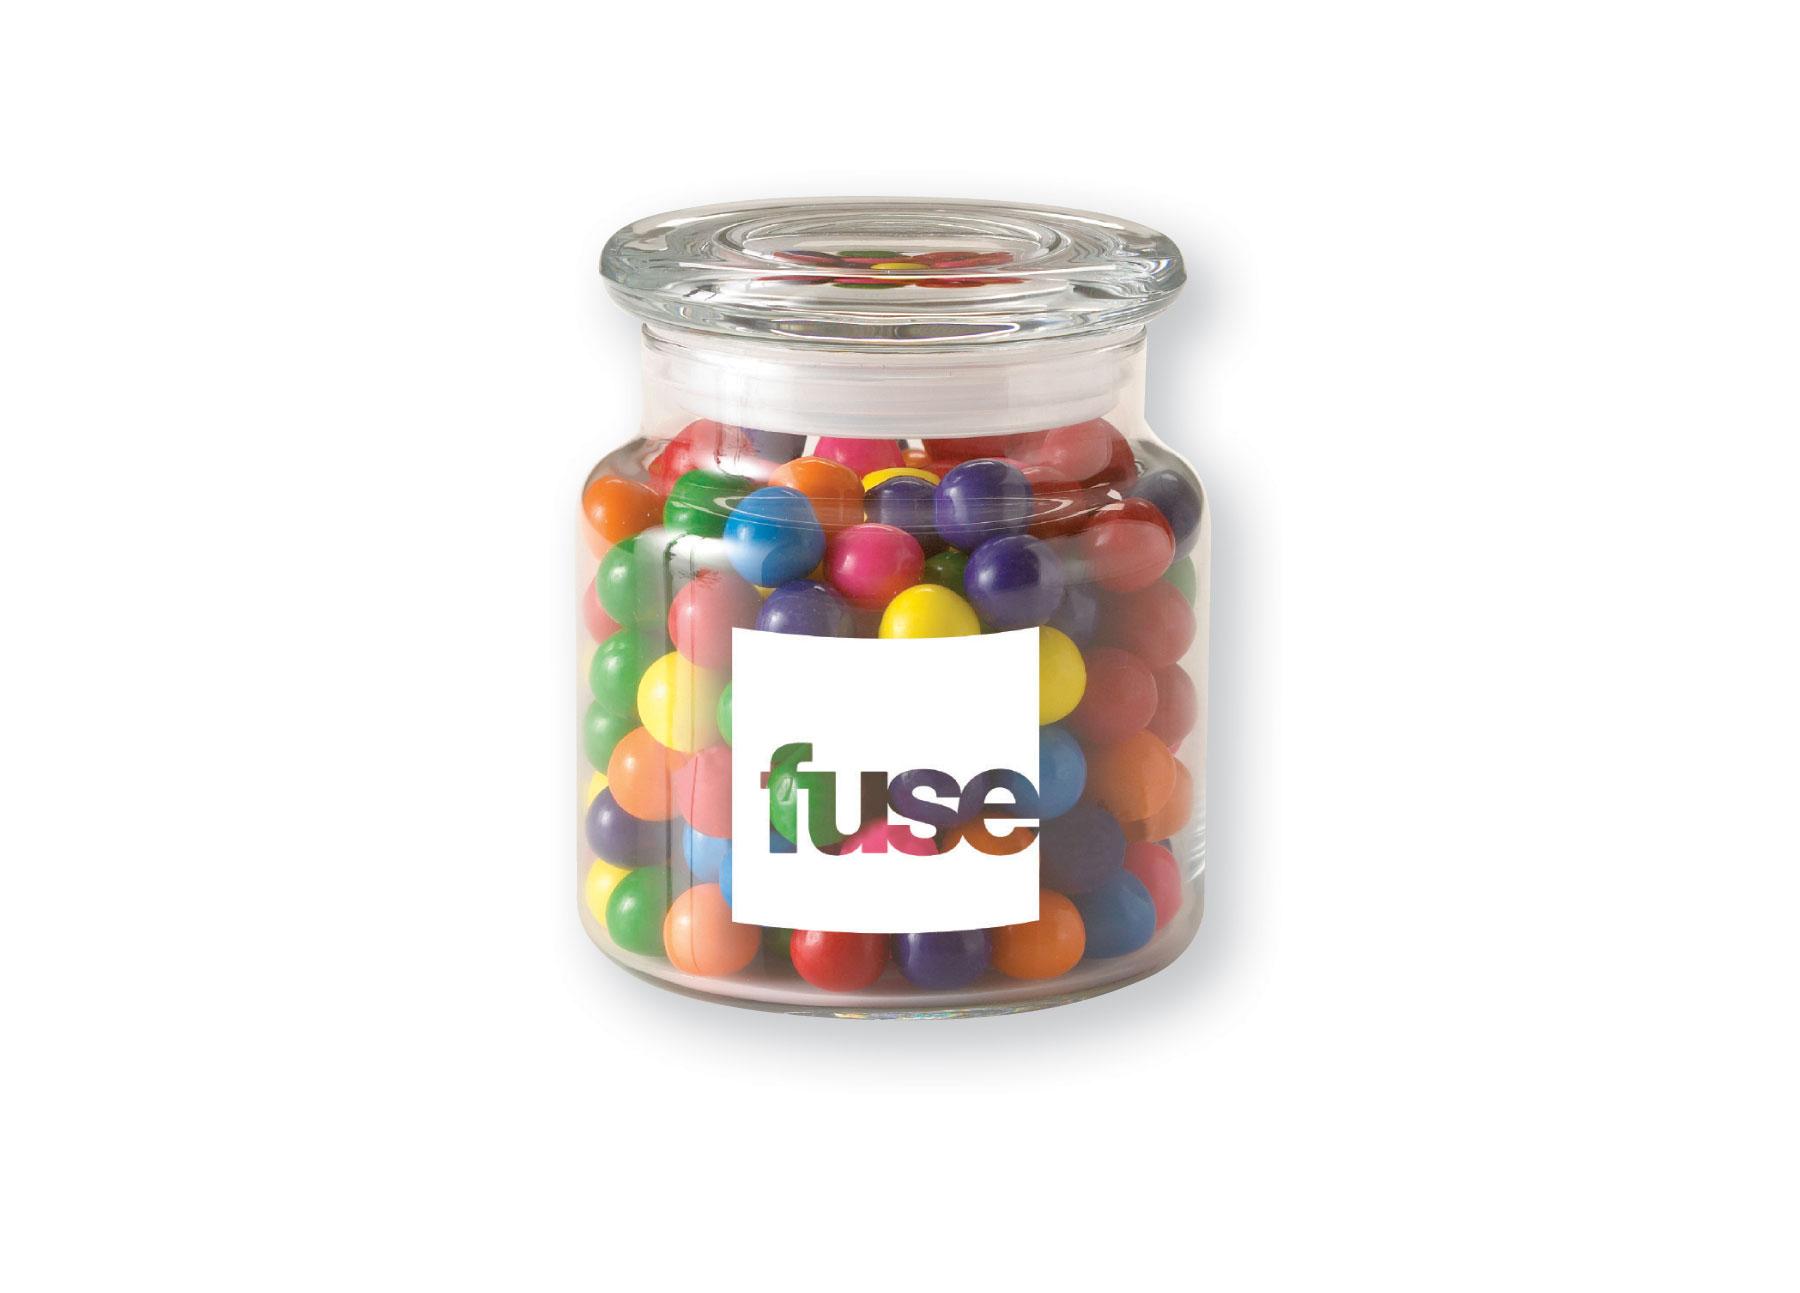 22 Oz. Glass Jar w/ Rainbow Bubble Gum, G220-DBG, One Colour Imprint